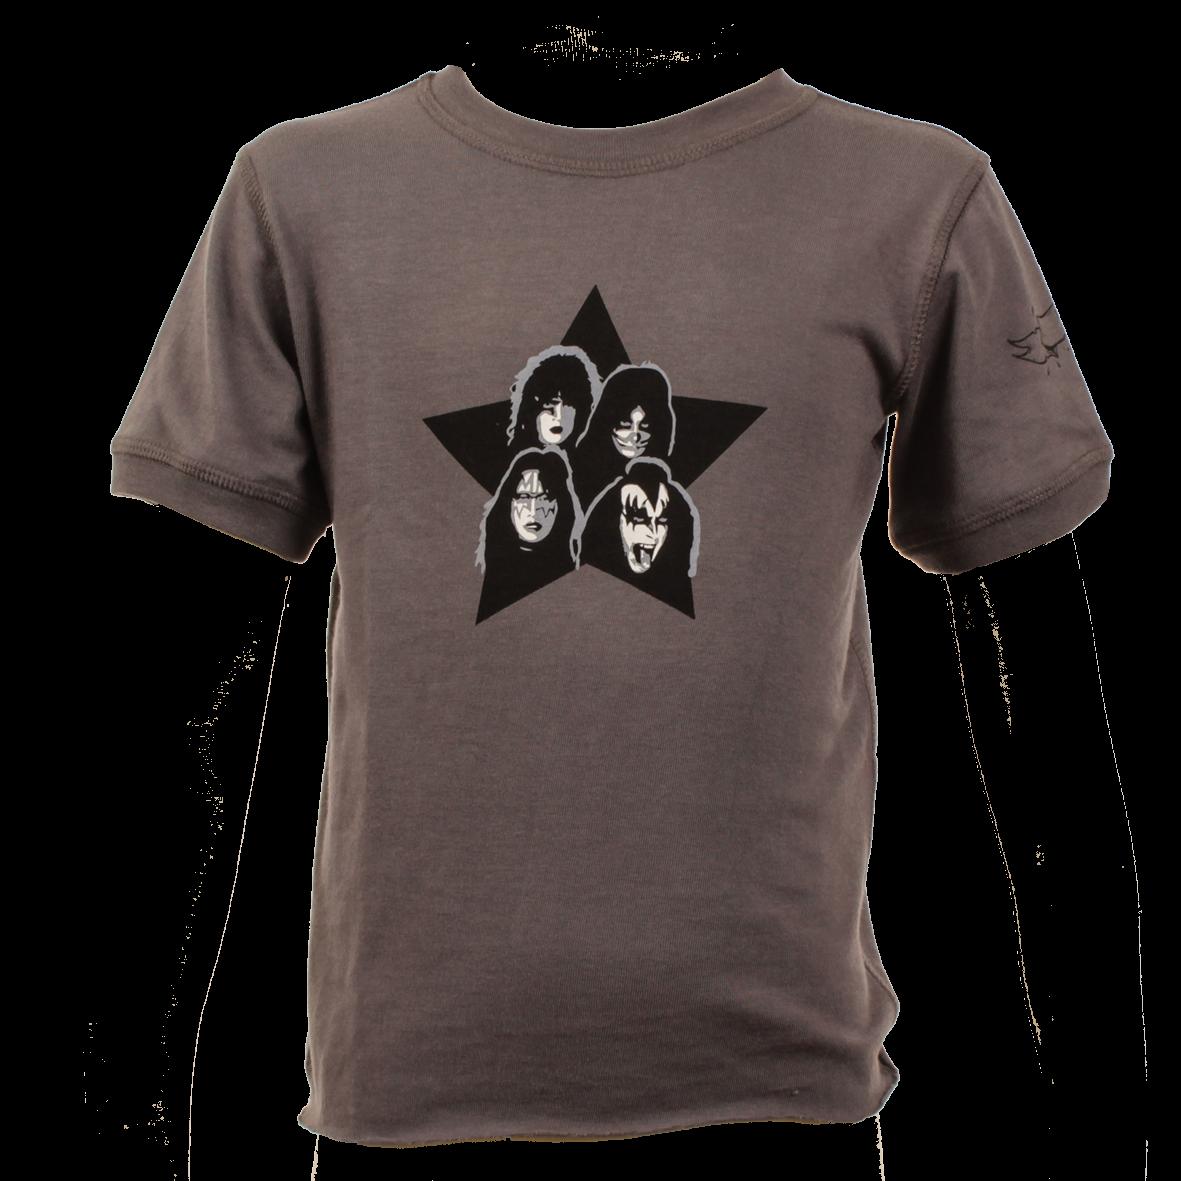 Kiss Baby T-shirt Vintage Black